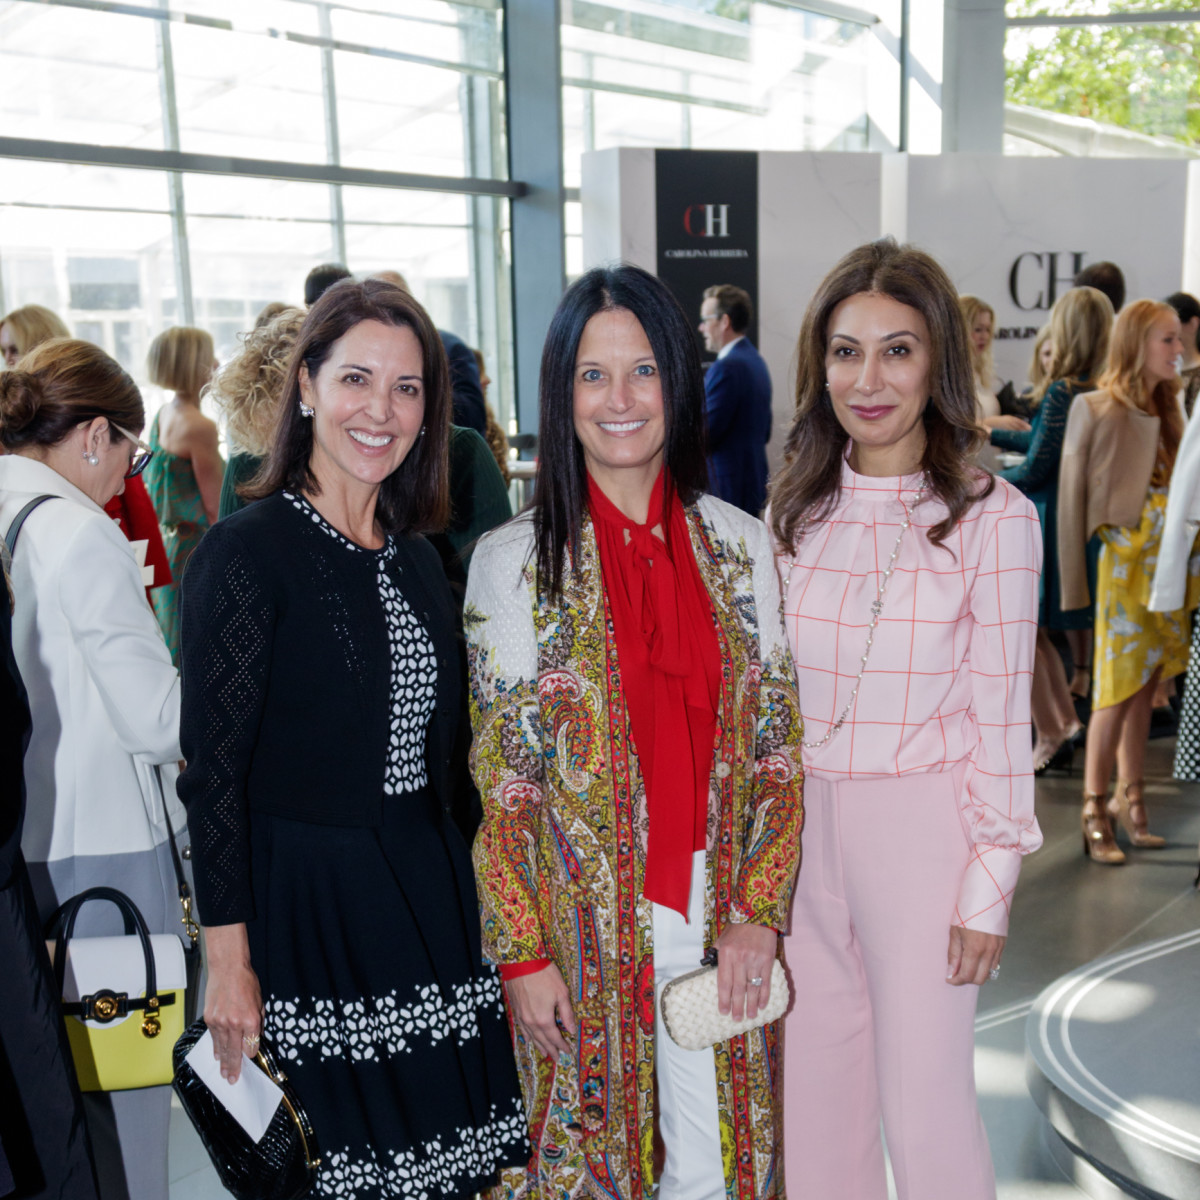 Sharon Bowers, Kimberly Williams, Aneeta Goomar